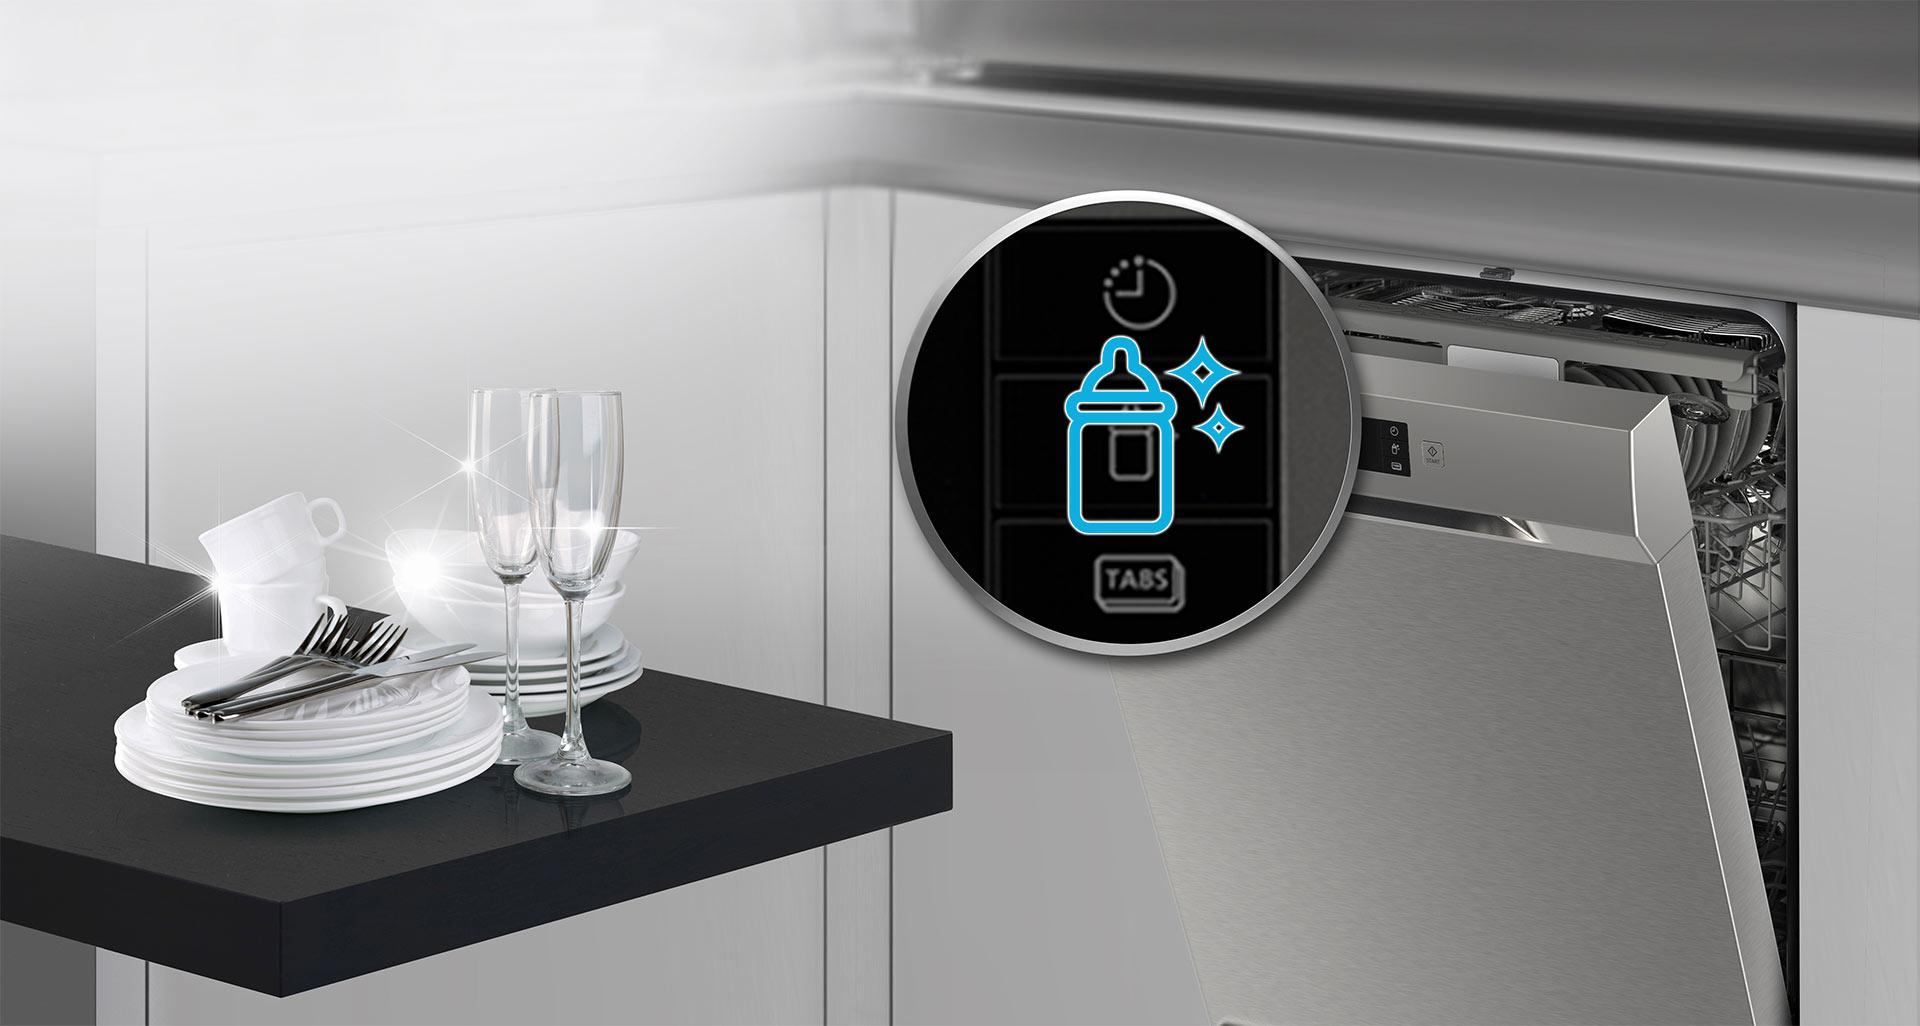 ماشین ظرفشویی سامسونگ DW60M5060BB (3)-min